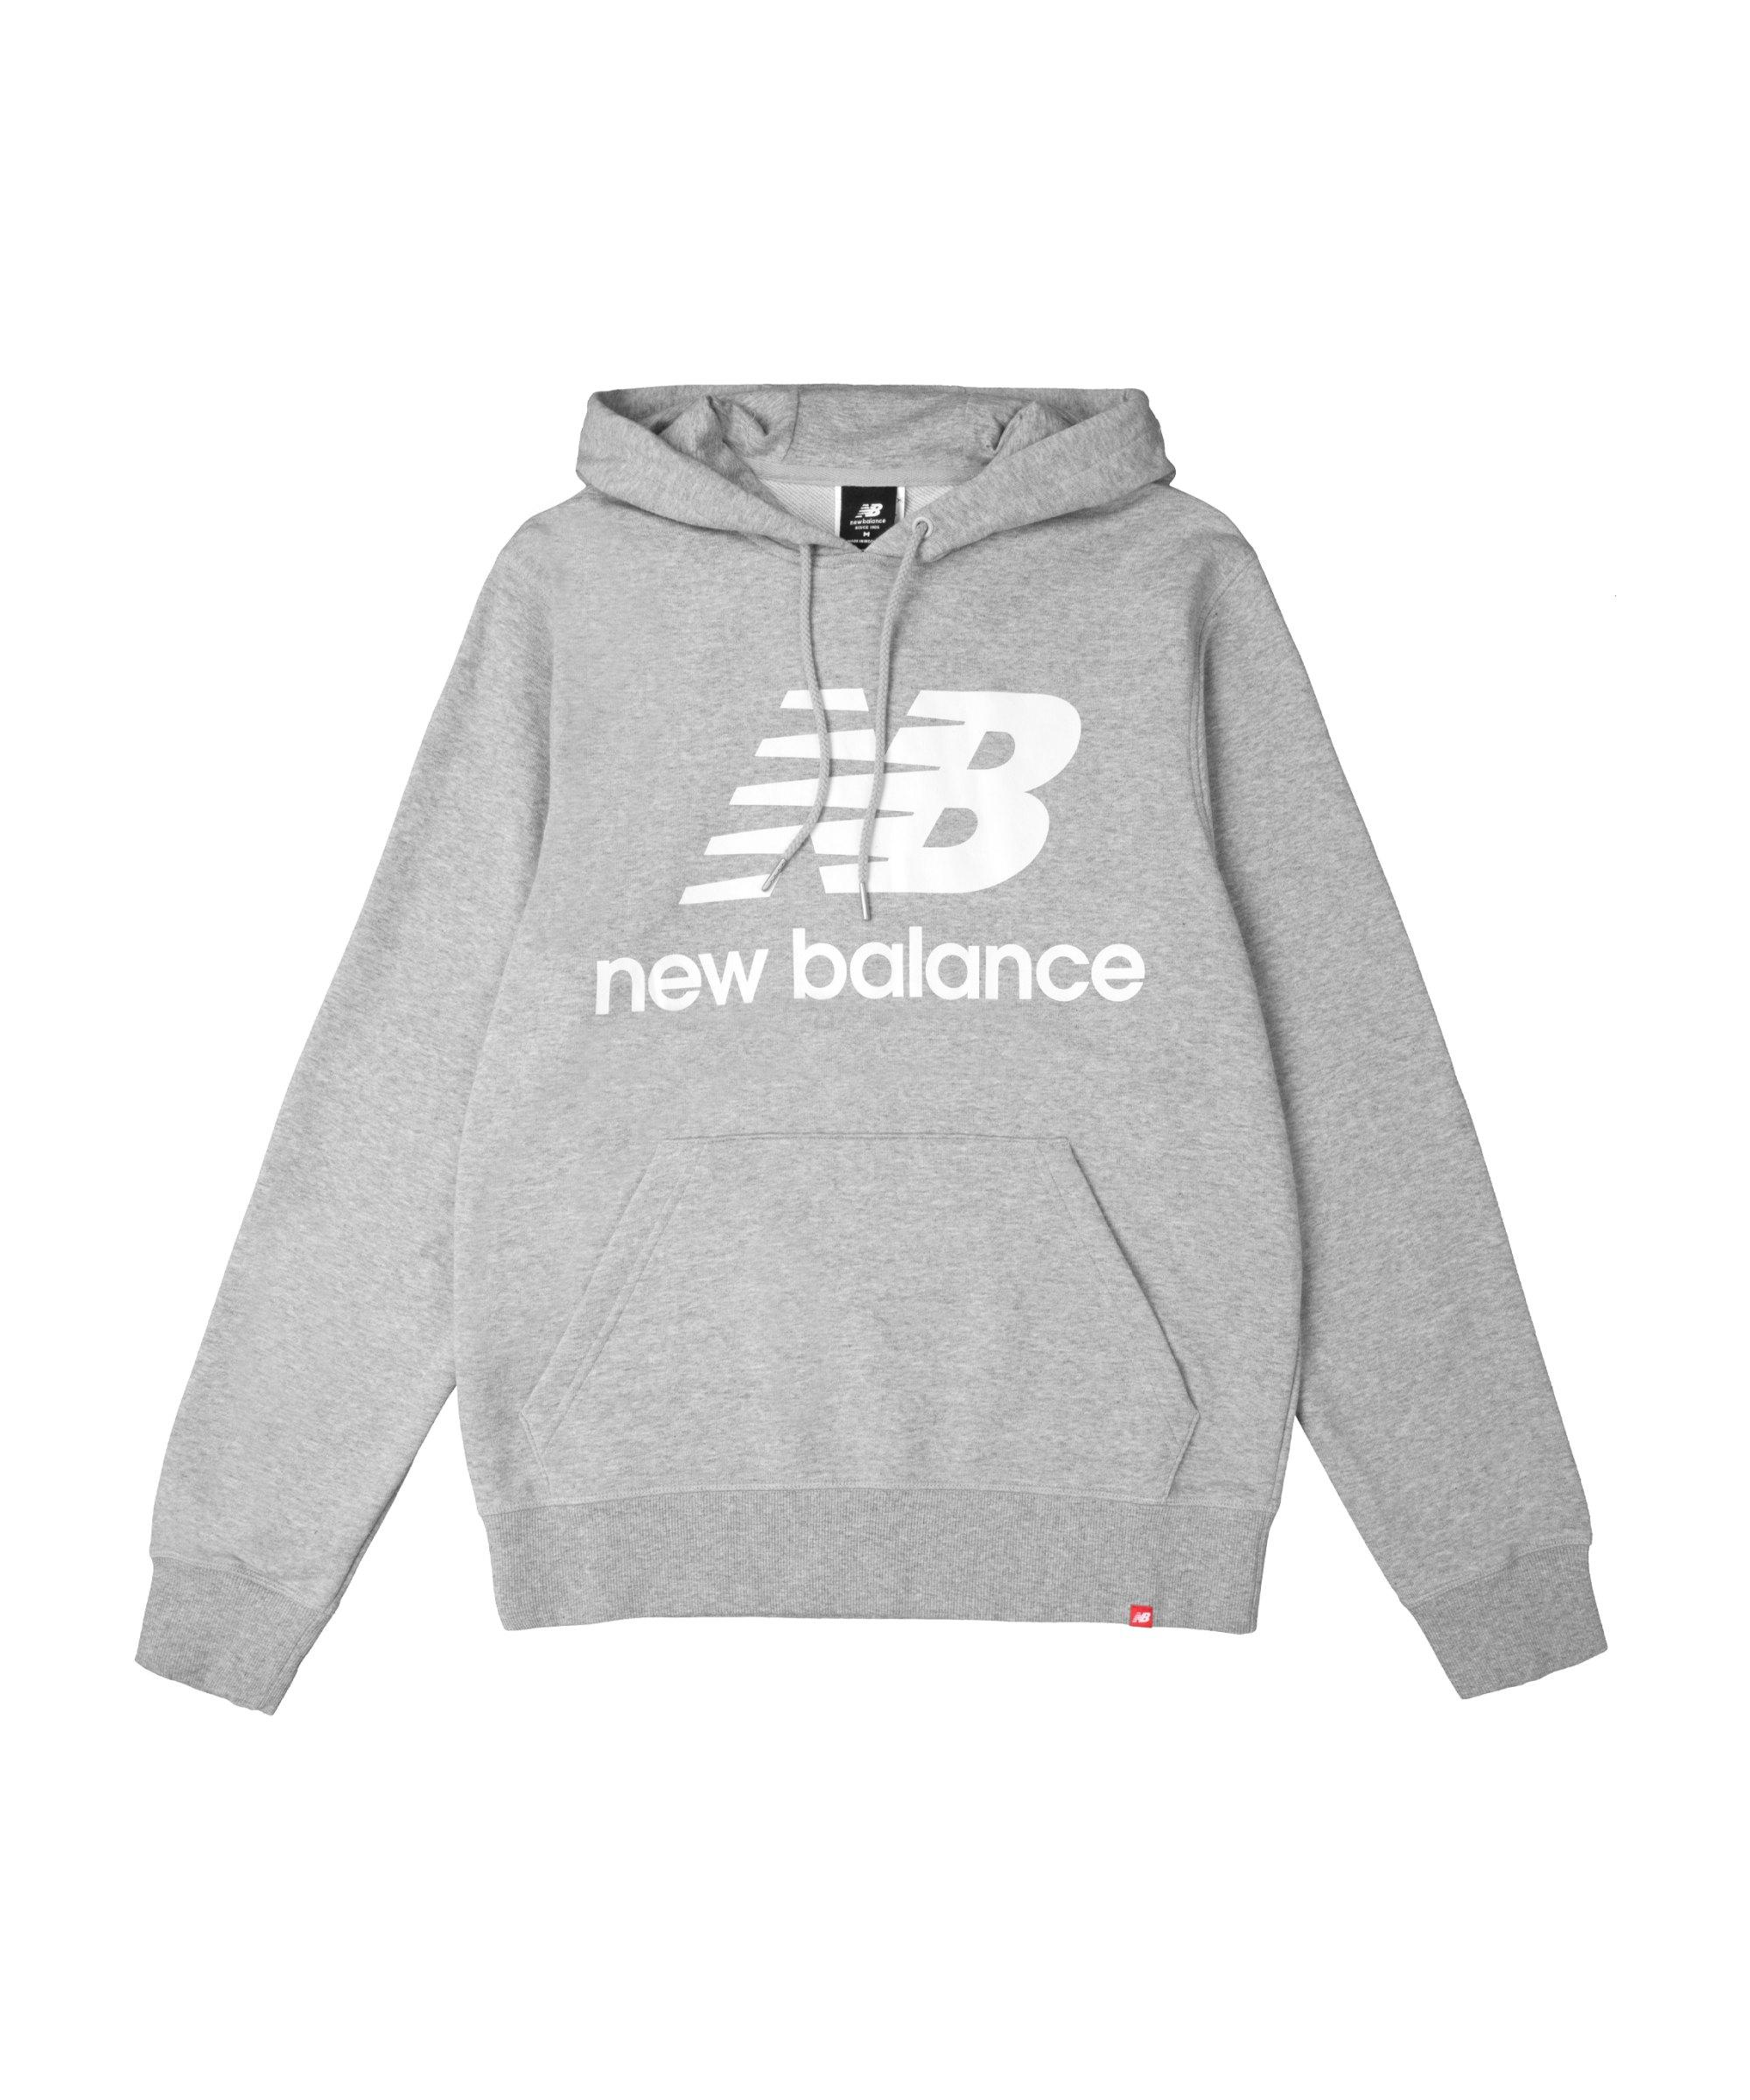 New Balance Essentials Stacked Logo Hoody Grau FAG - grau